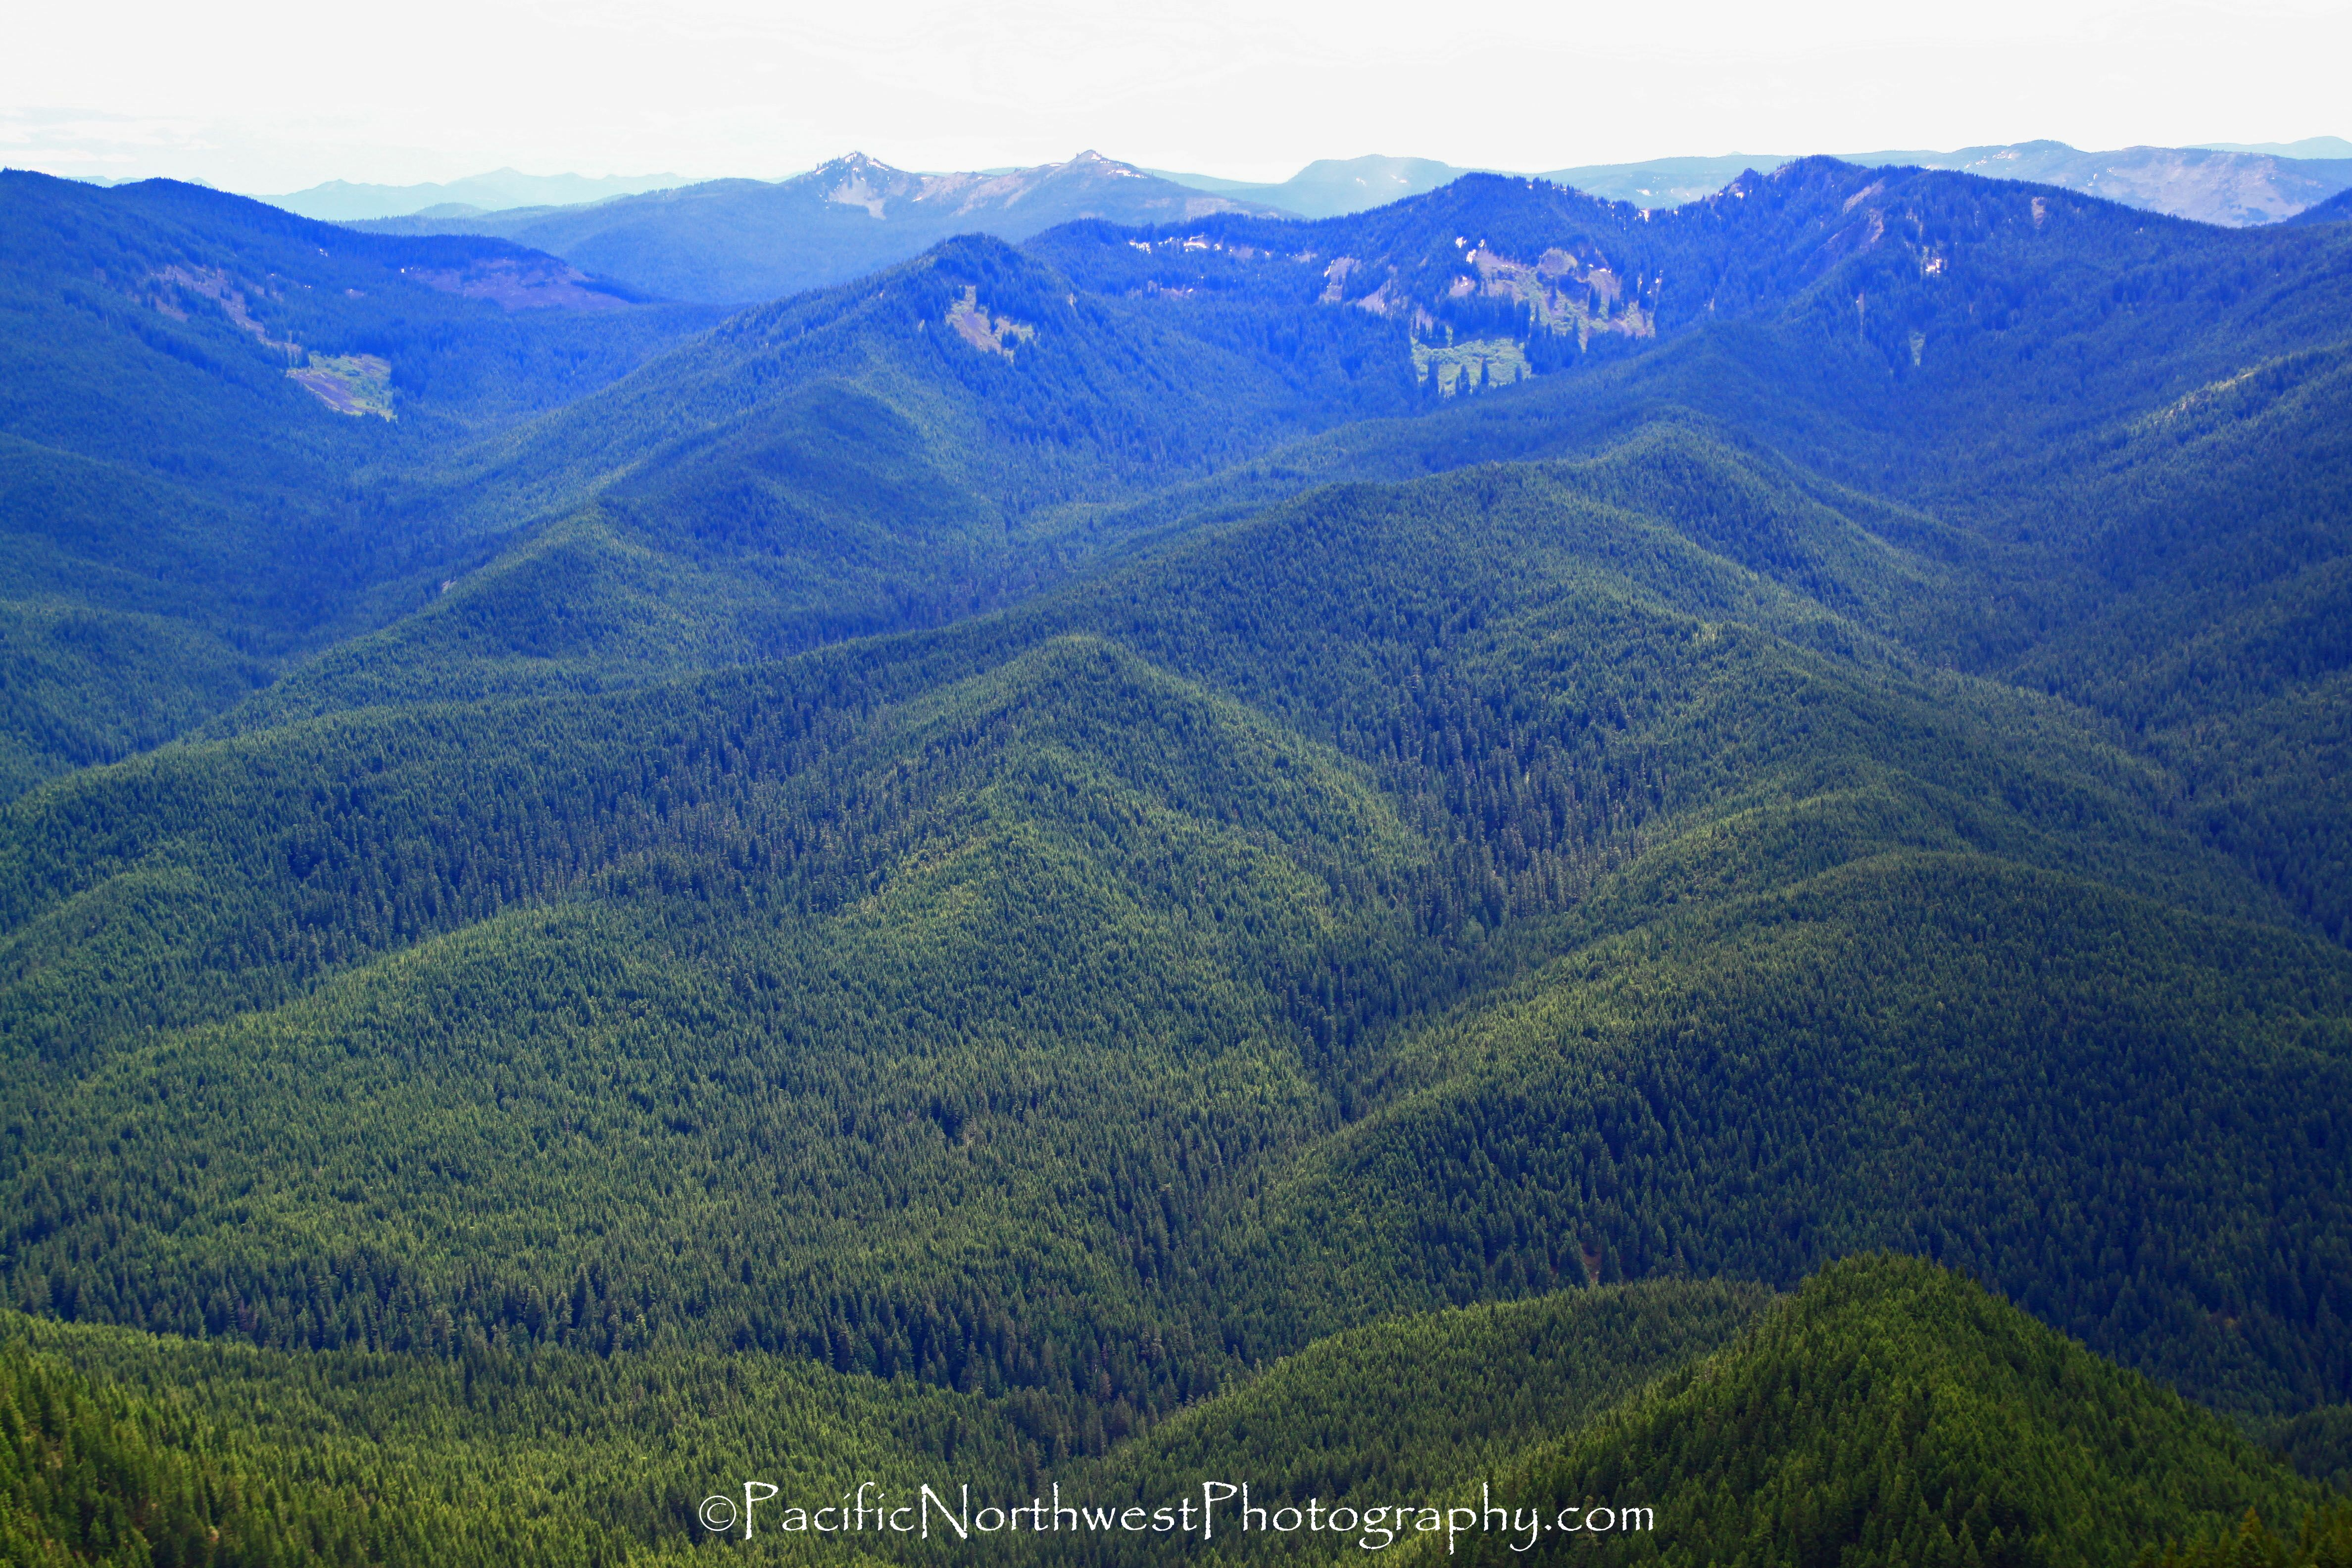 Salmon-Huckleberry Forest, Oregon